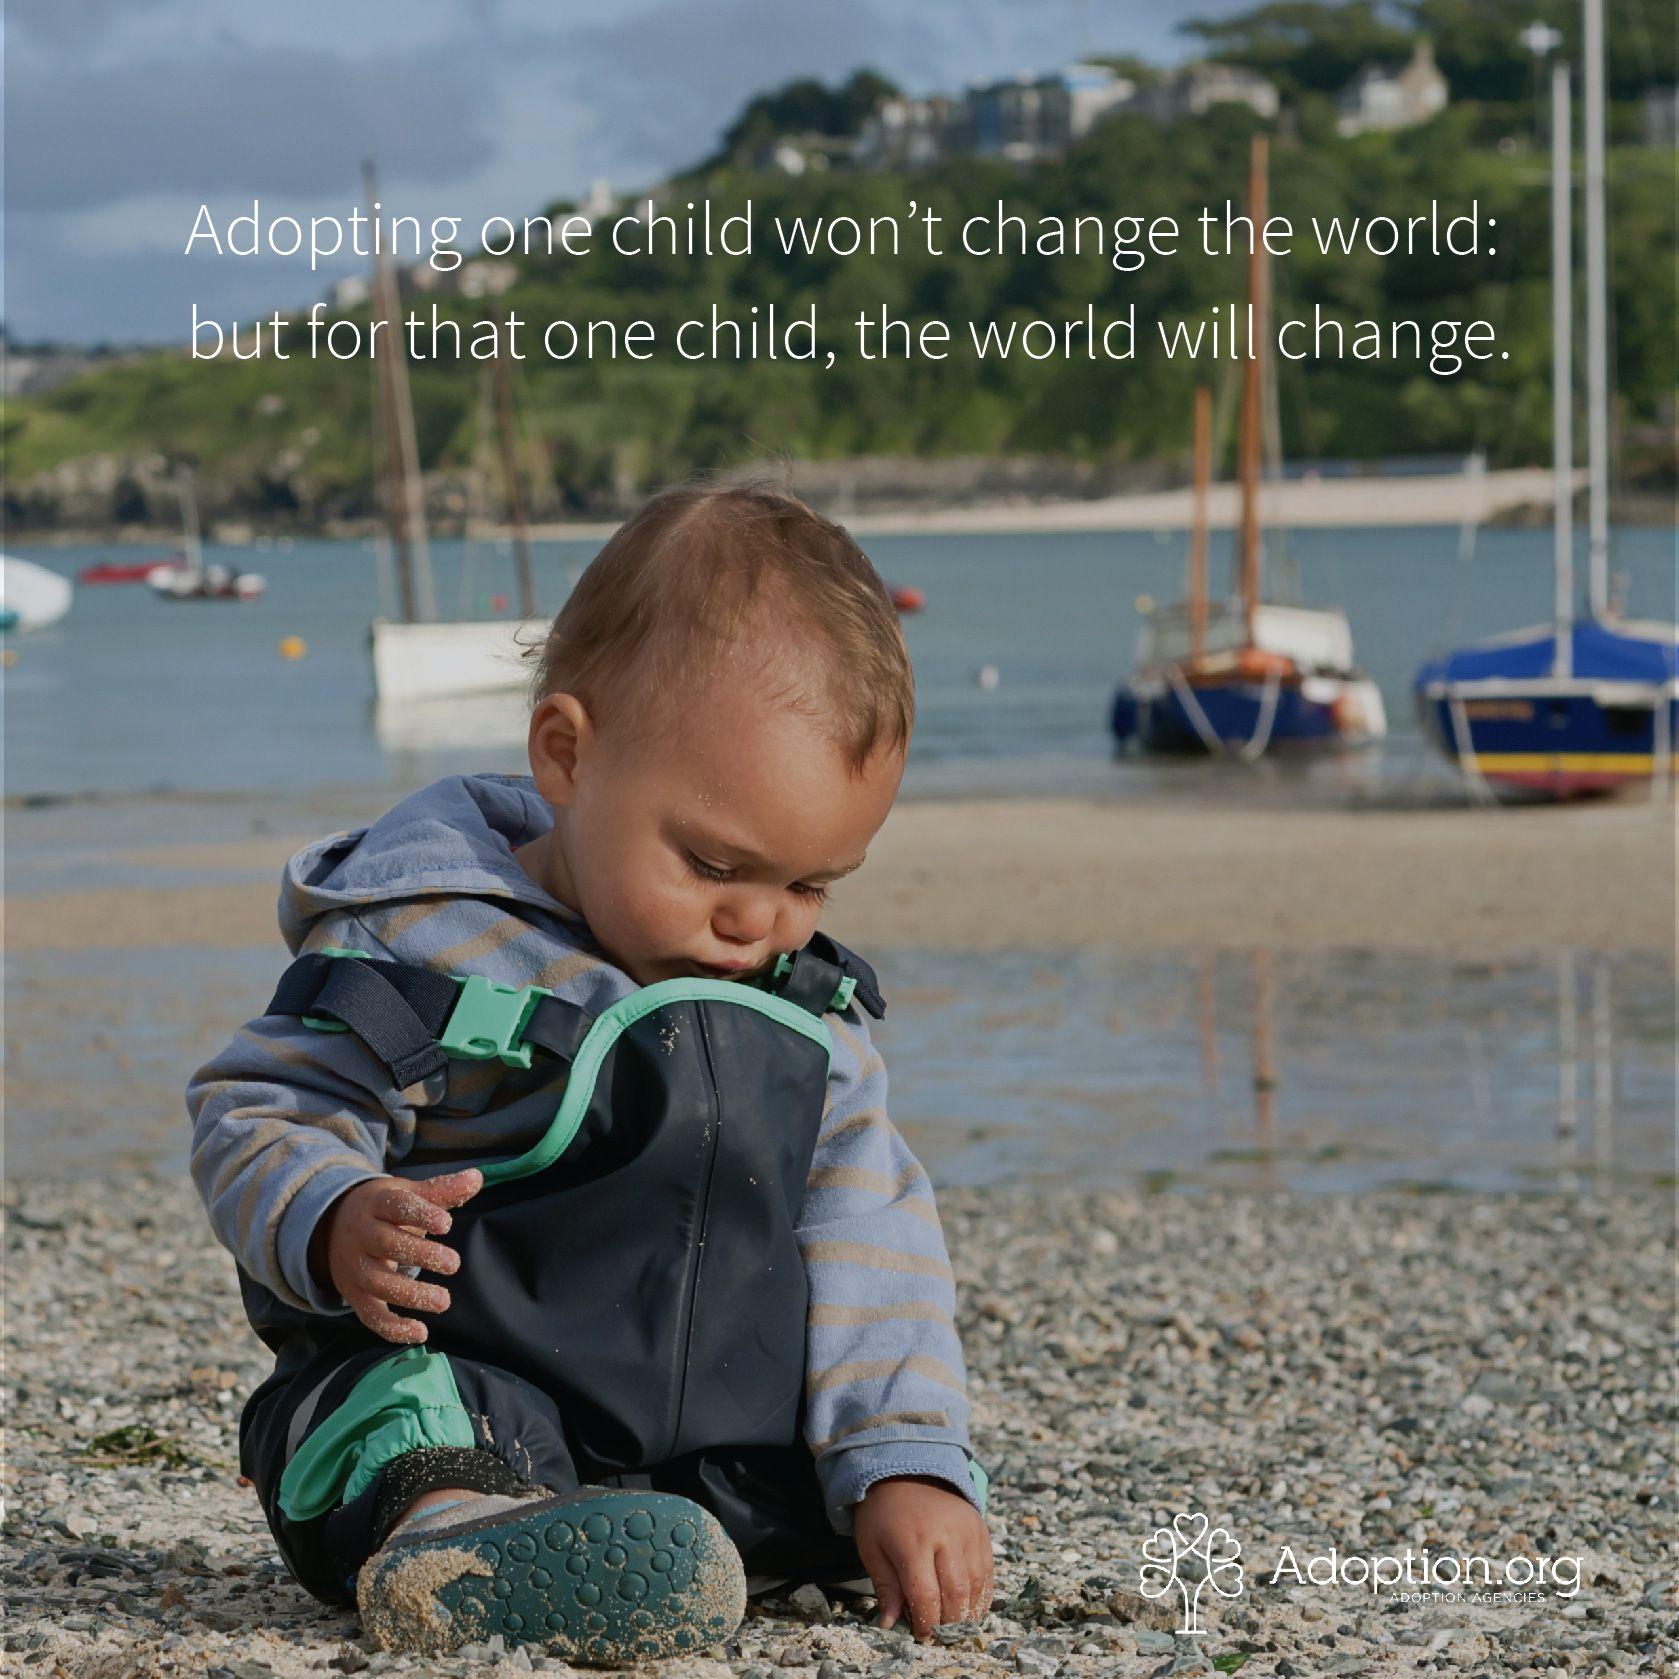 Adopting one child won't change the world: but for that one child, the world will change. #adoption #adopt #child